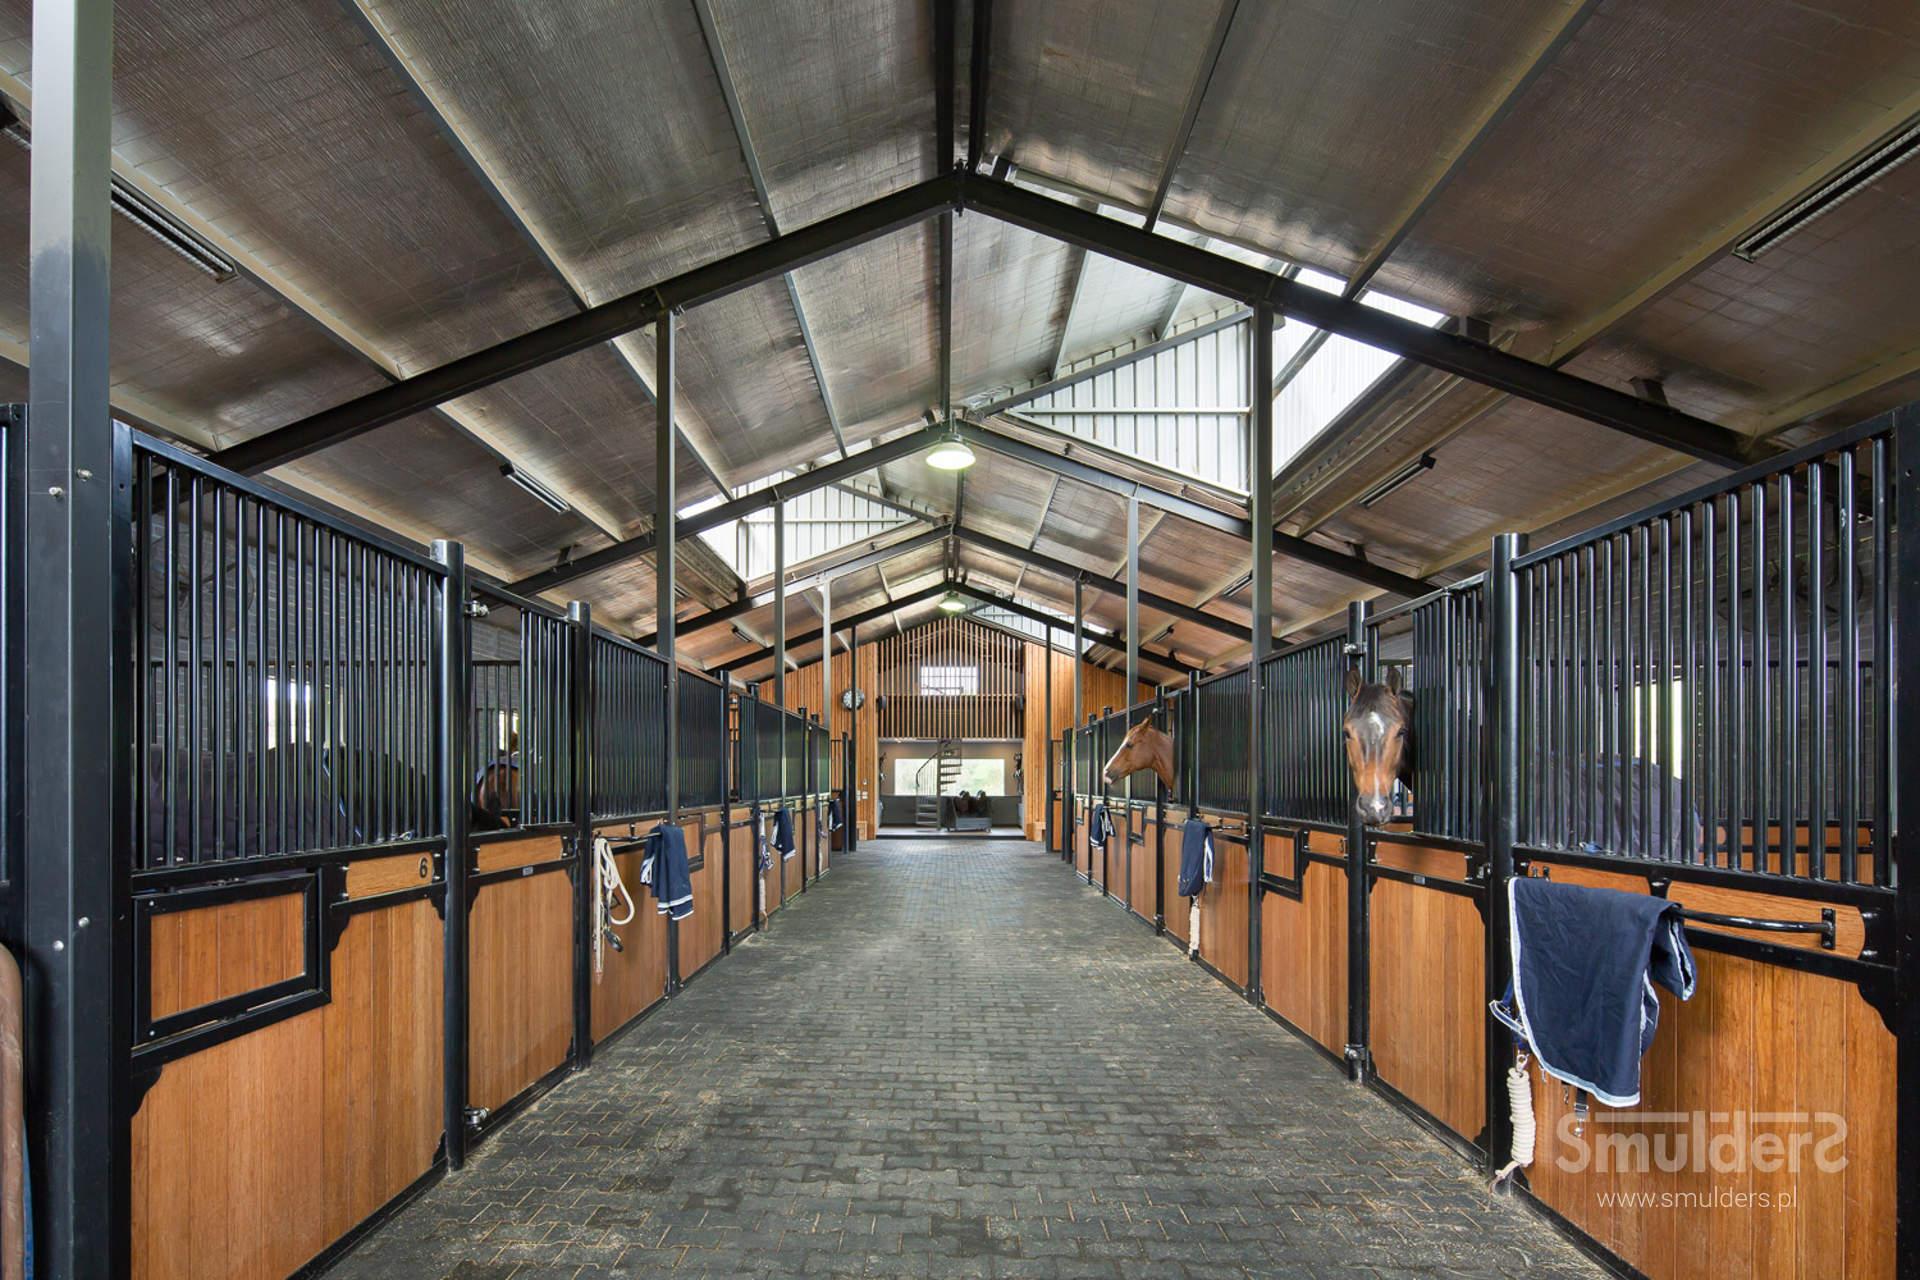 http://www.smulders.pl/wp-content/uploads/2019/10/f004_buckingham_barn-doors_doors_windows_KIL_SMULDERS_PL.jpg